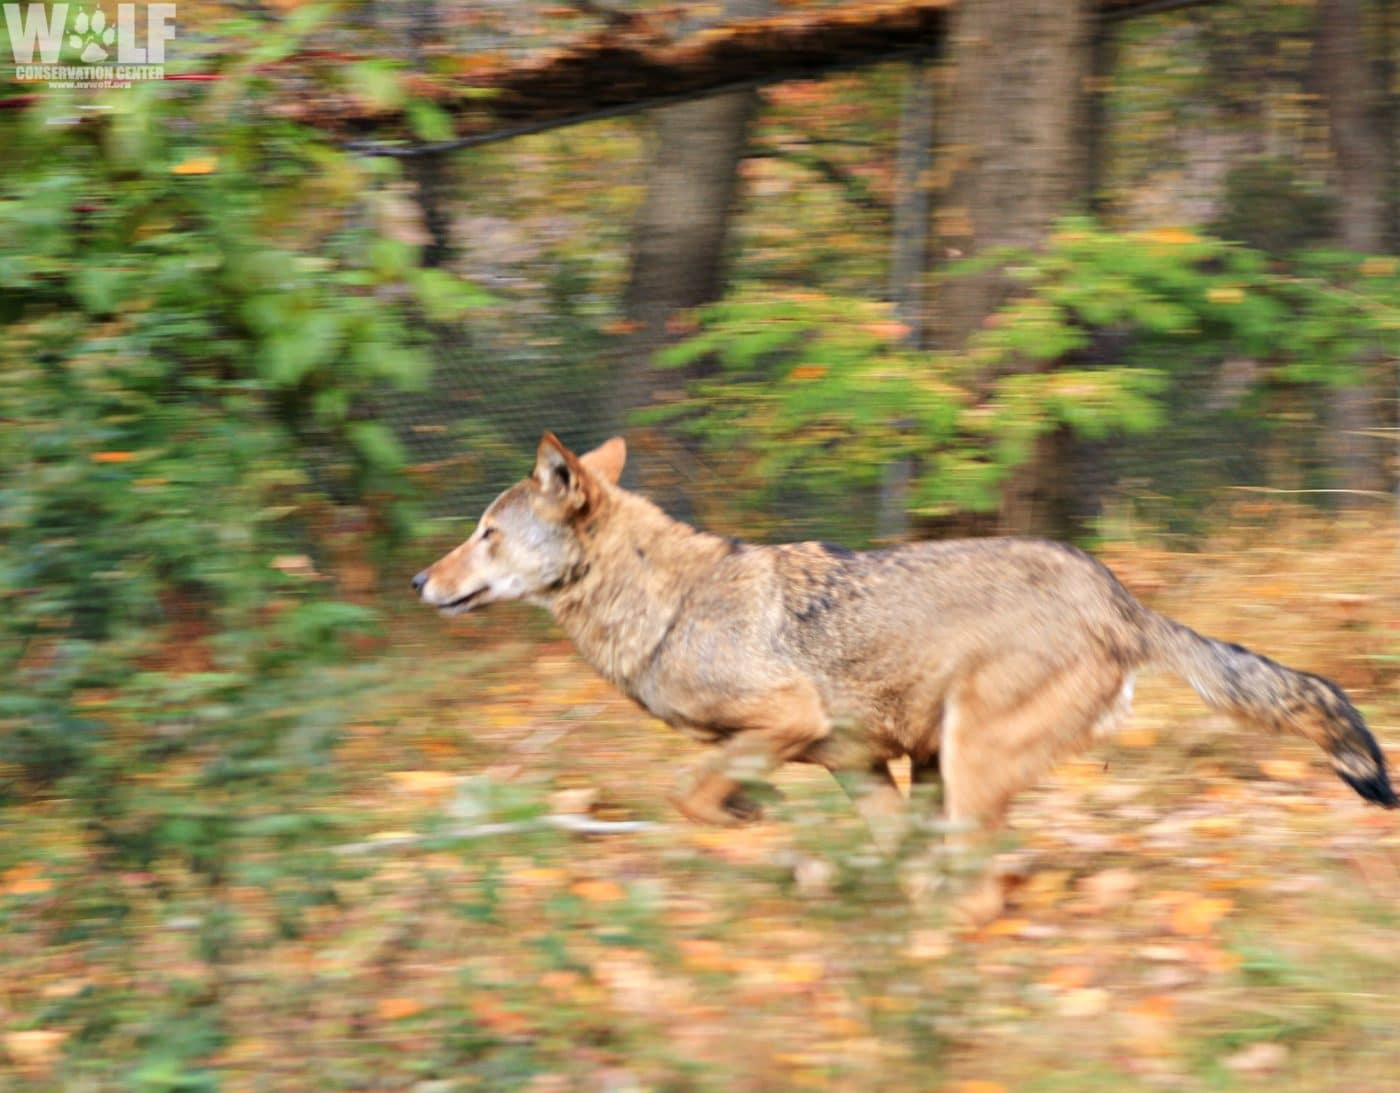 Wolf Conservation Center |